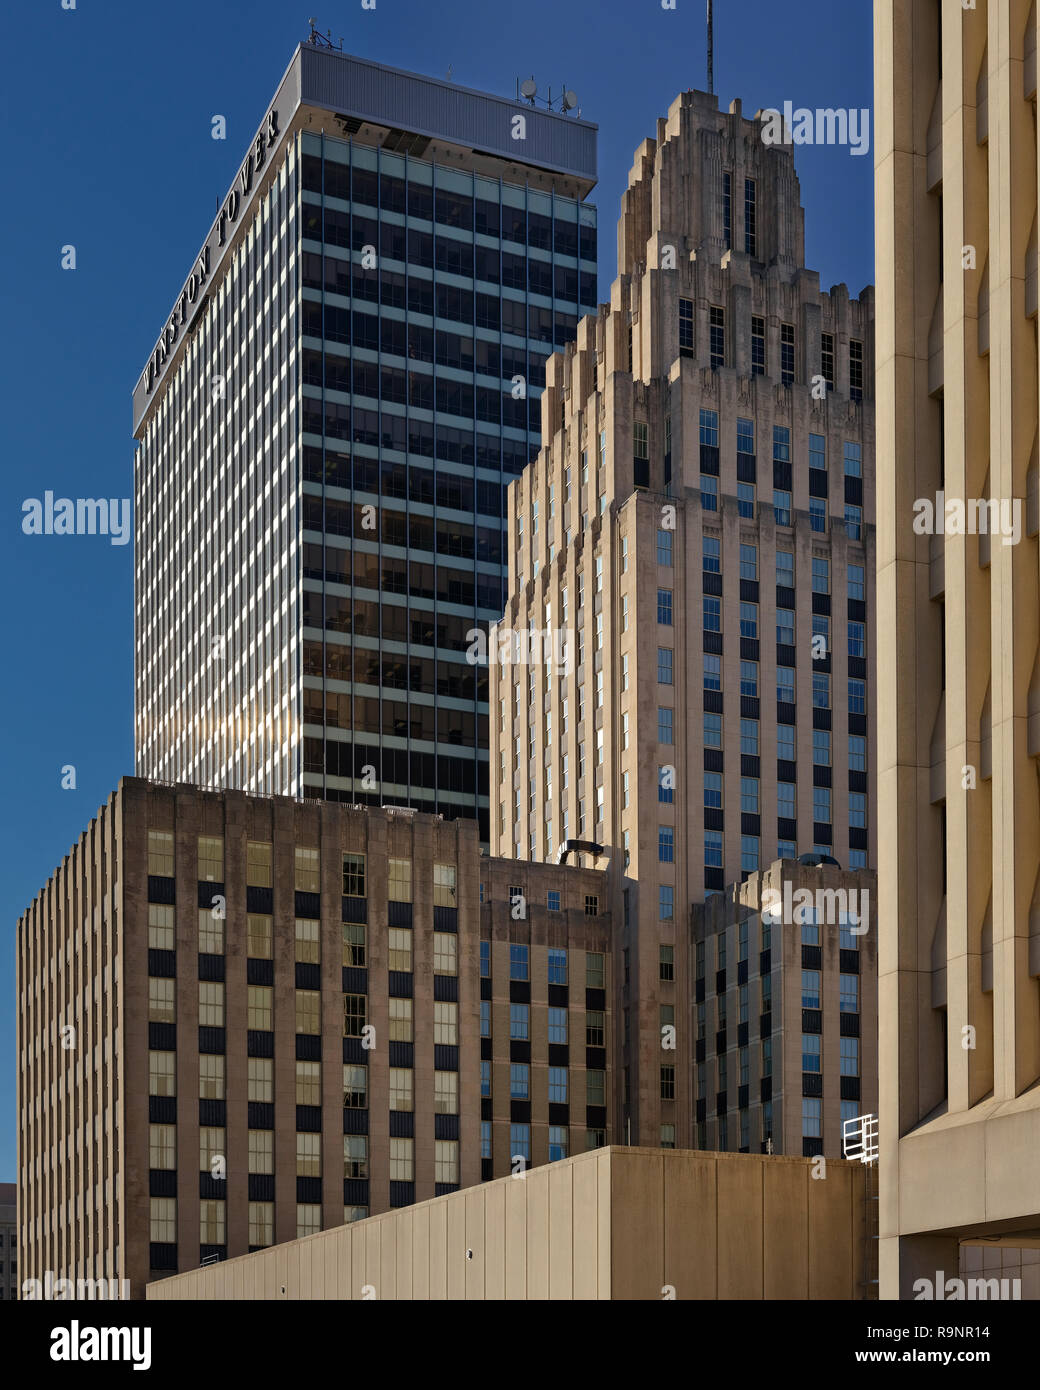 City Of Winston Salem >> City Of Winston Salem Architecture Reynolds Building Center